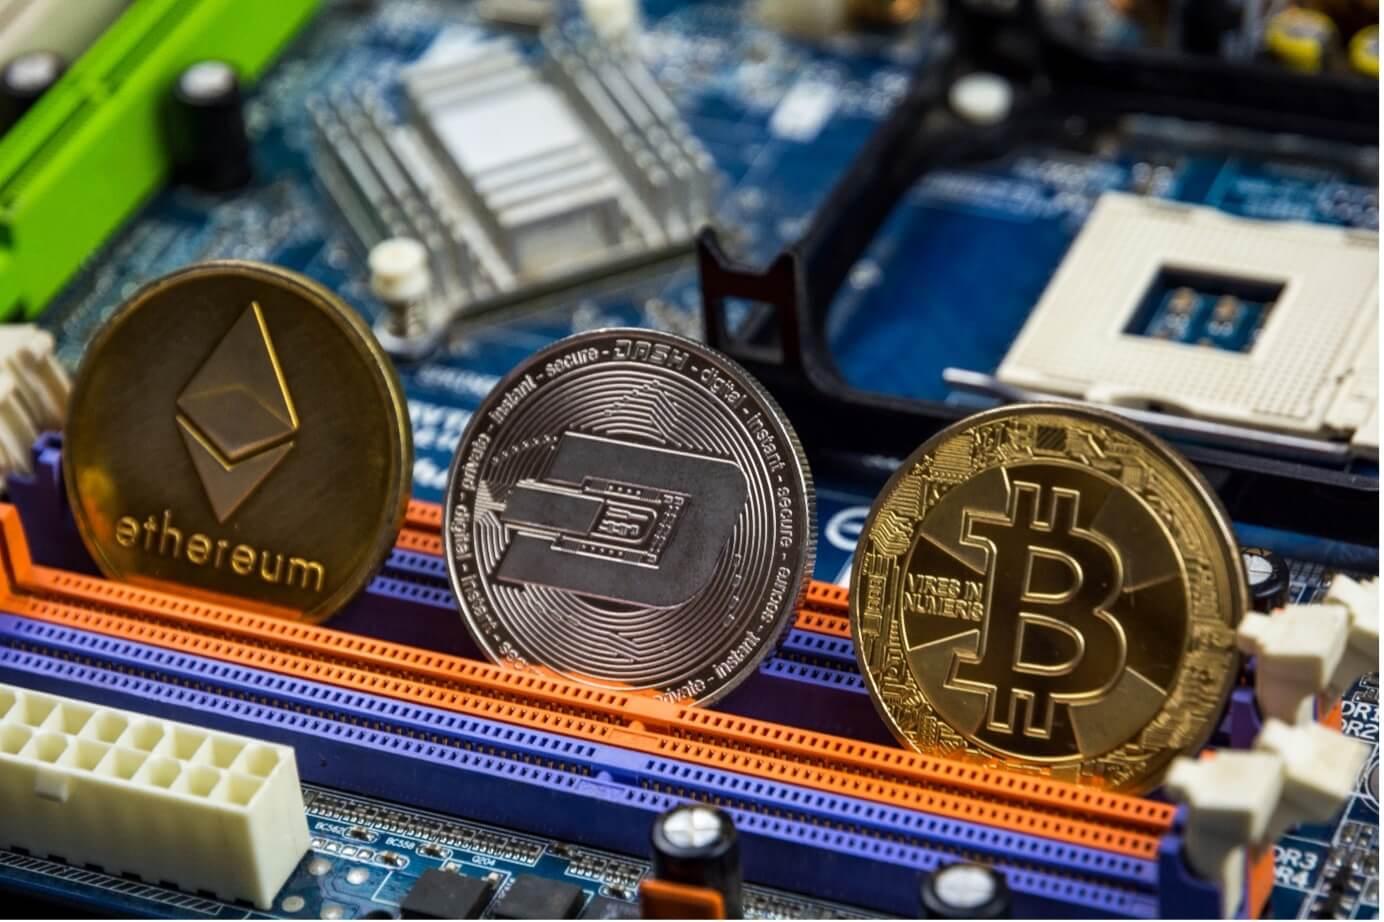 Ethereum, Dash, Bitcoin